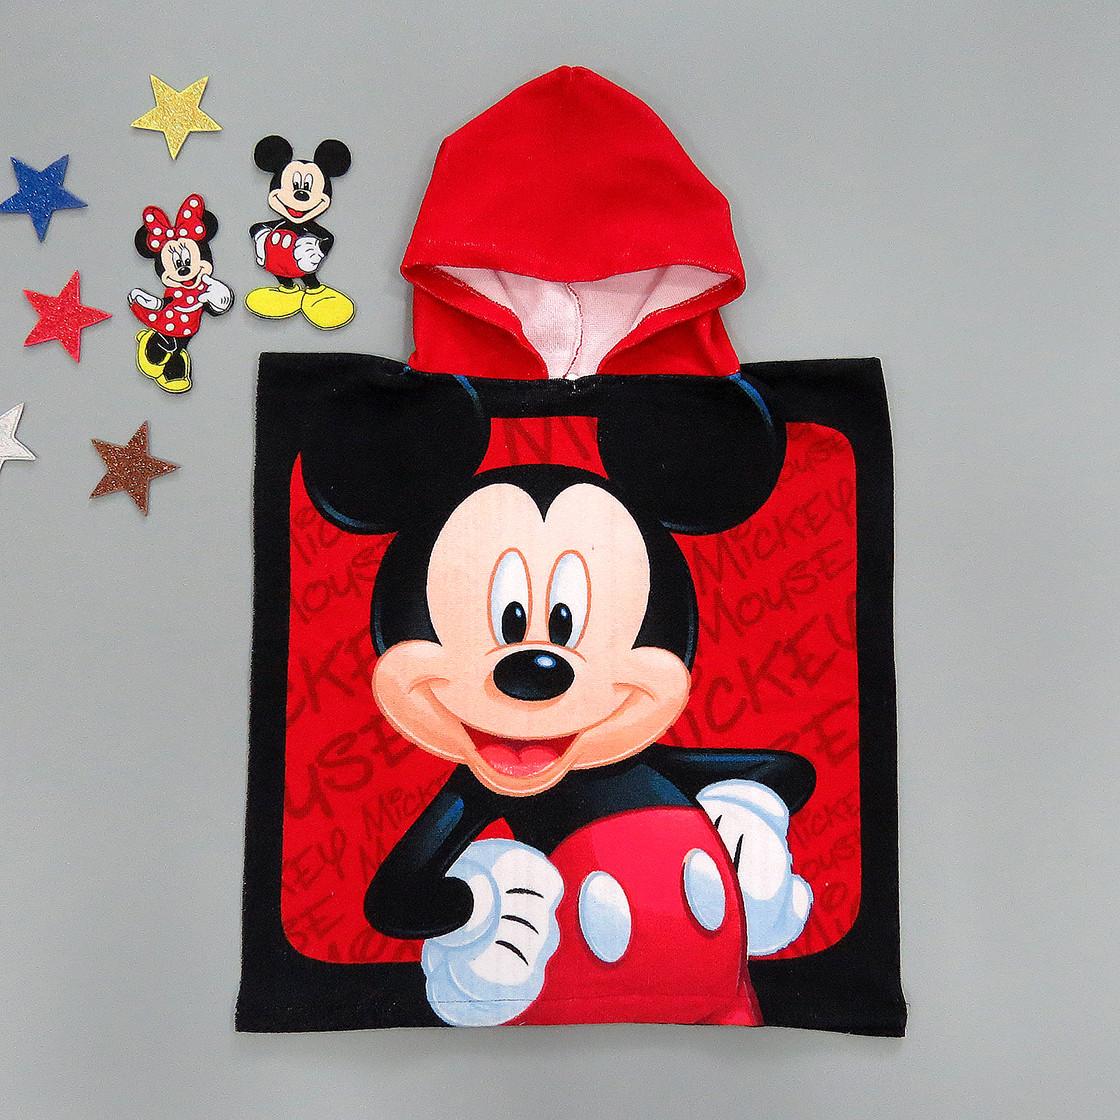 Махровое полотенце-пончо Mickey Mouse для мальчика